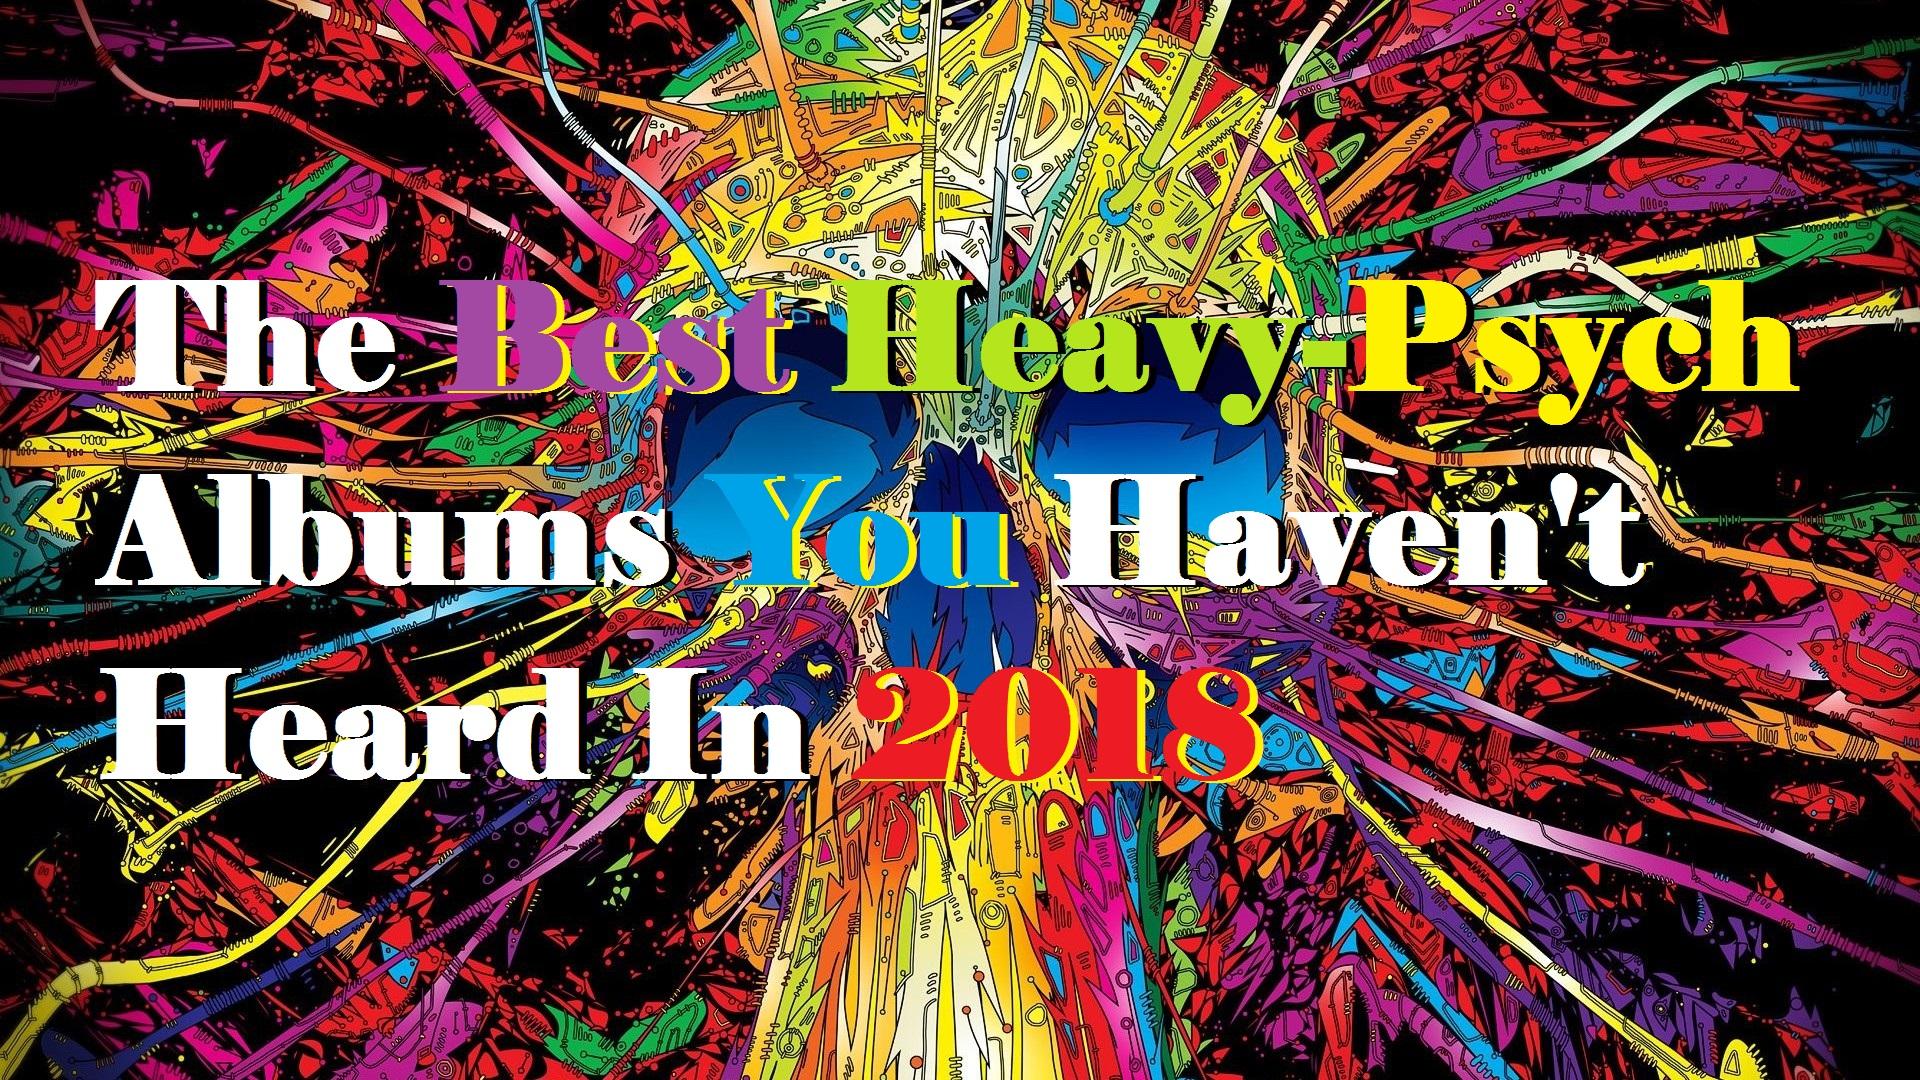 Best Heavy Psych Music 2018